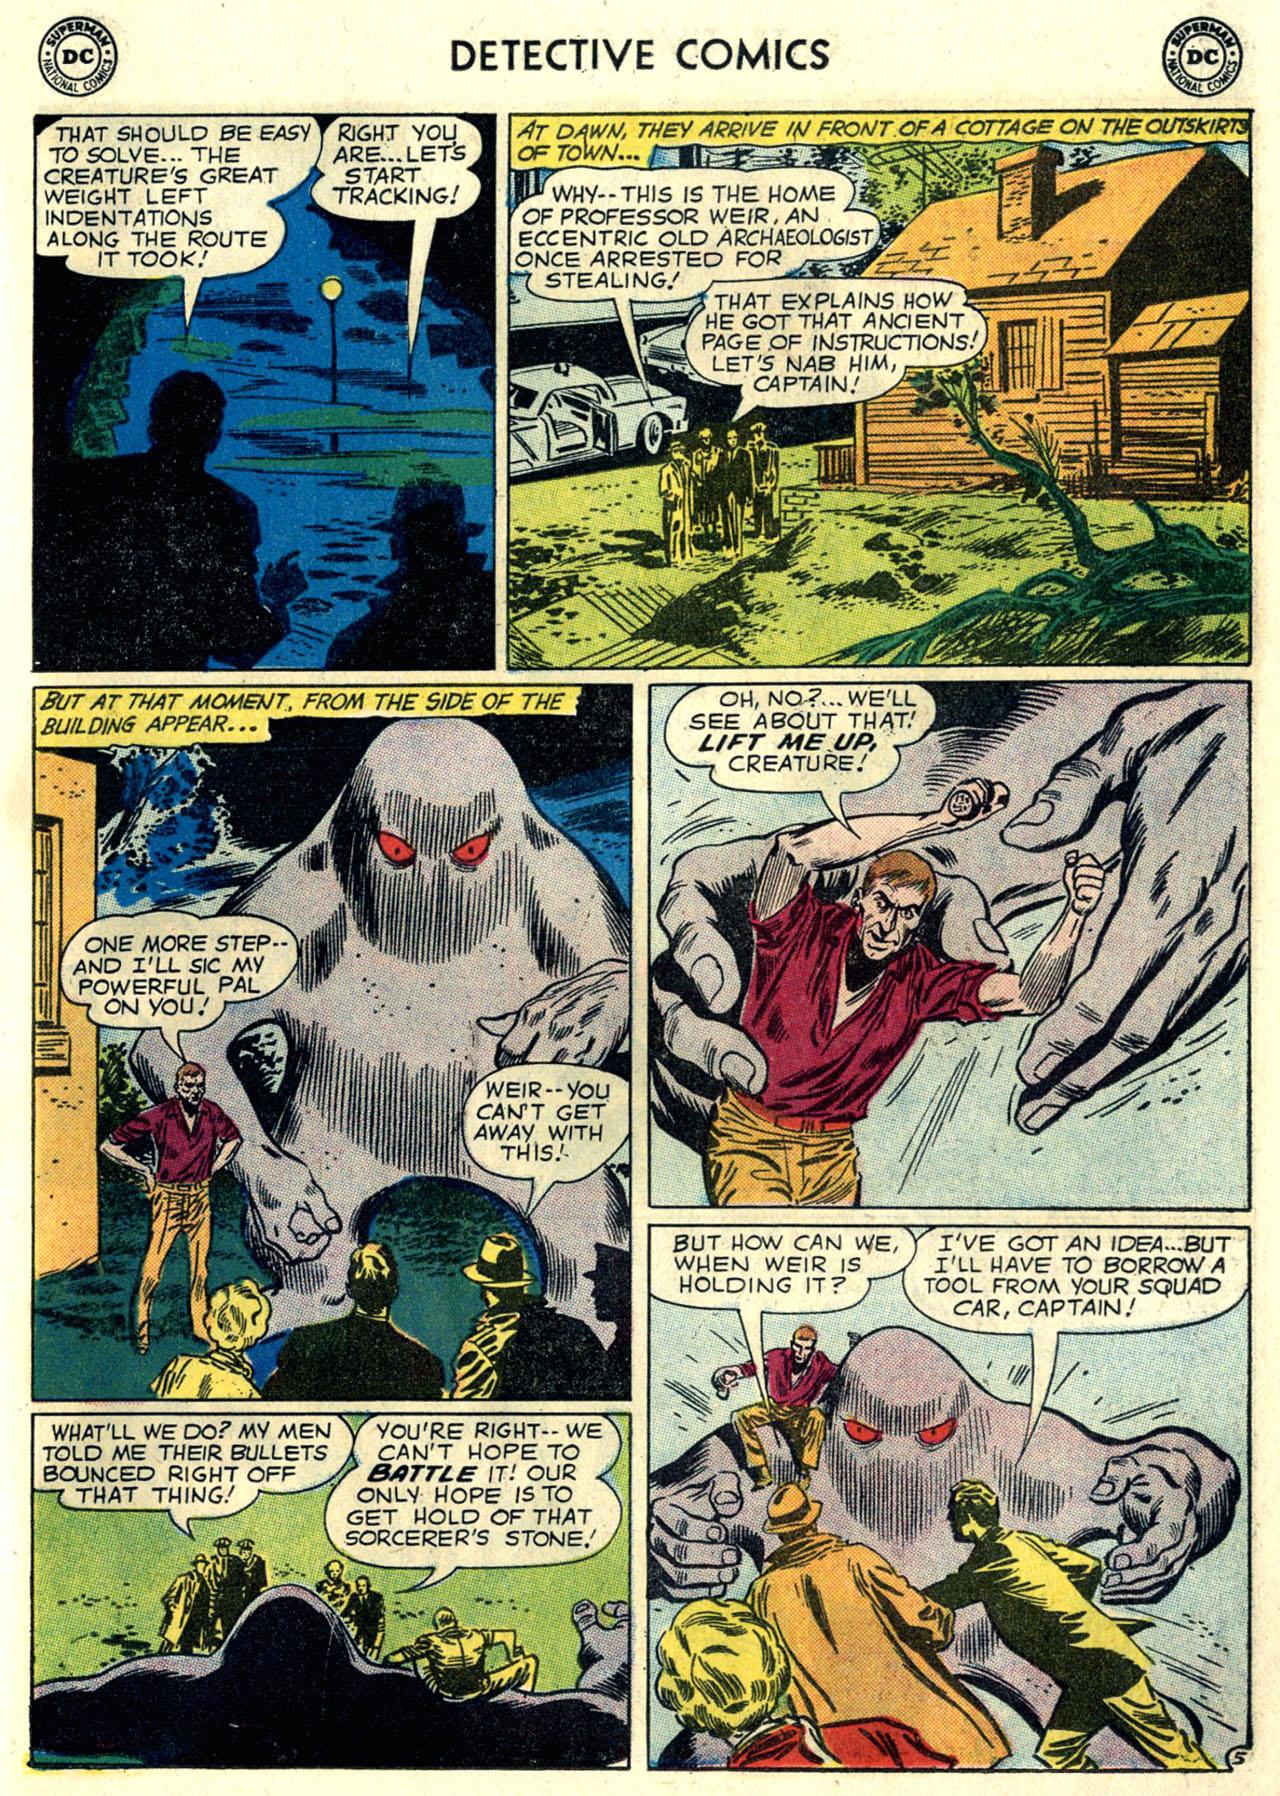 Detective Comics (1937) 279 Page 30